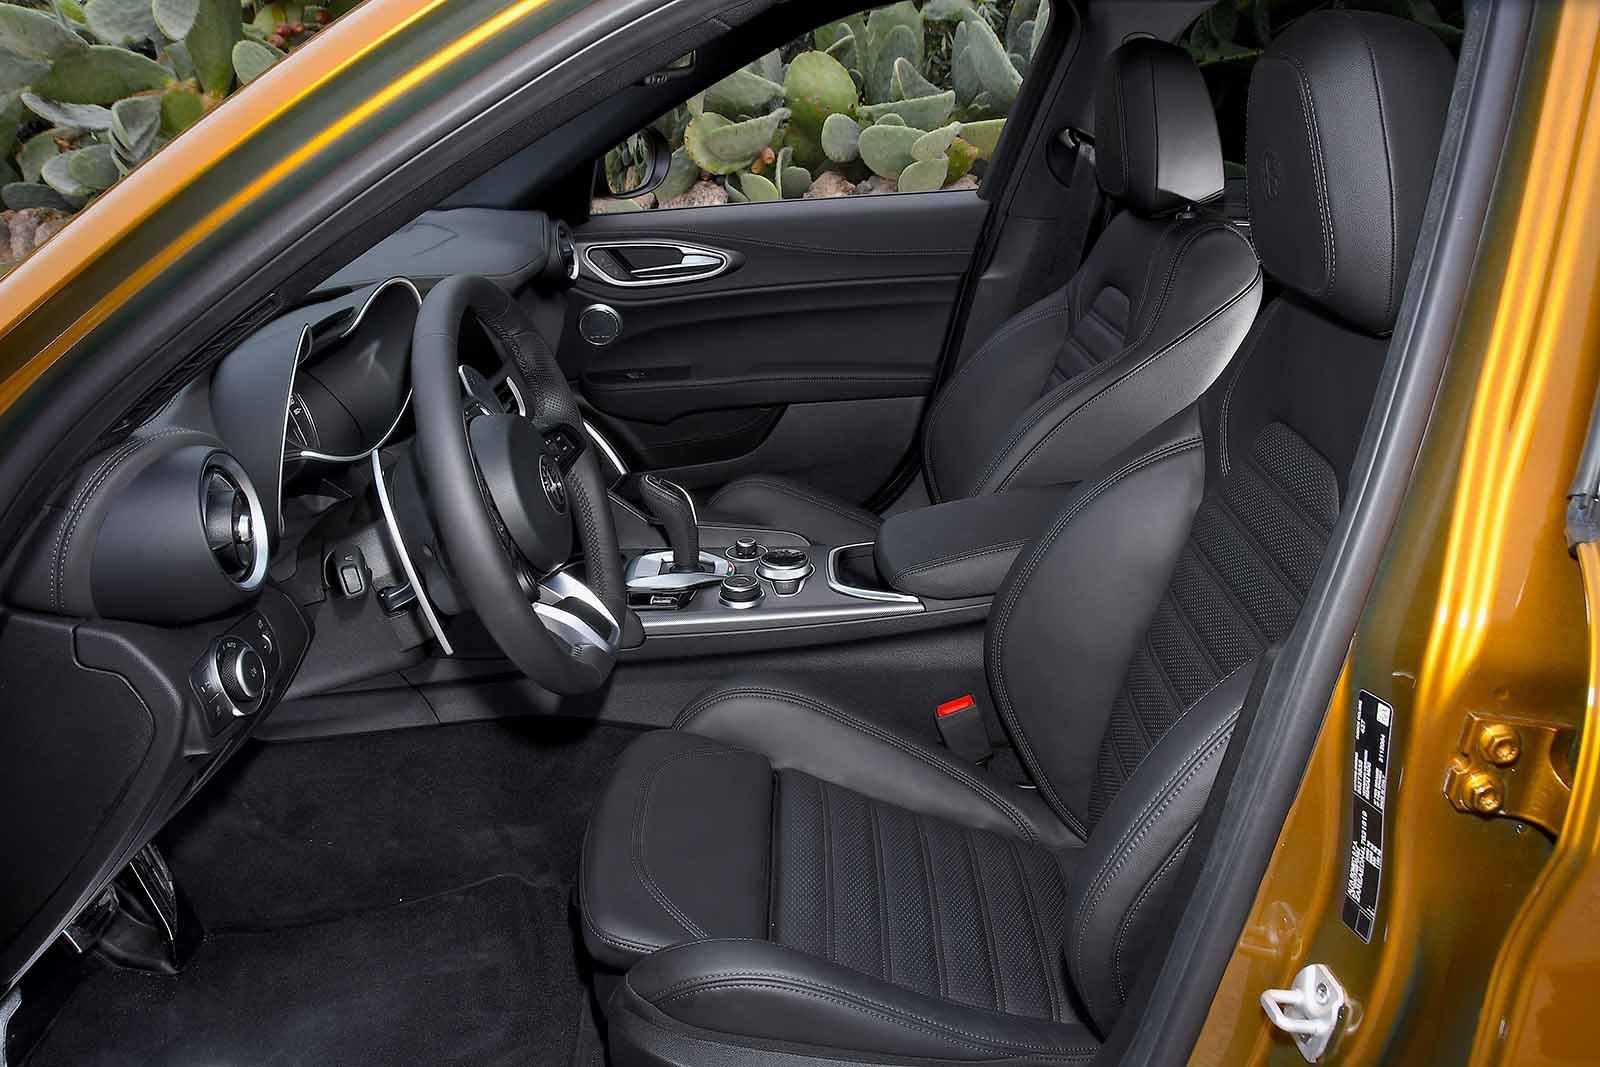 Alfa Romeo Giulia 2019 LHD front seats